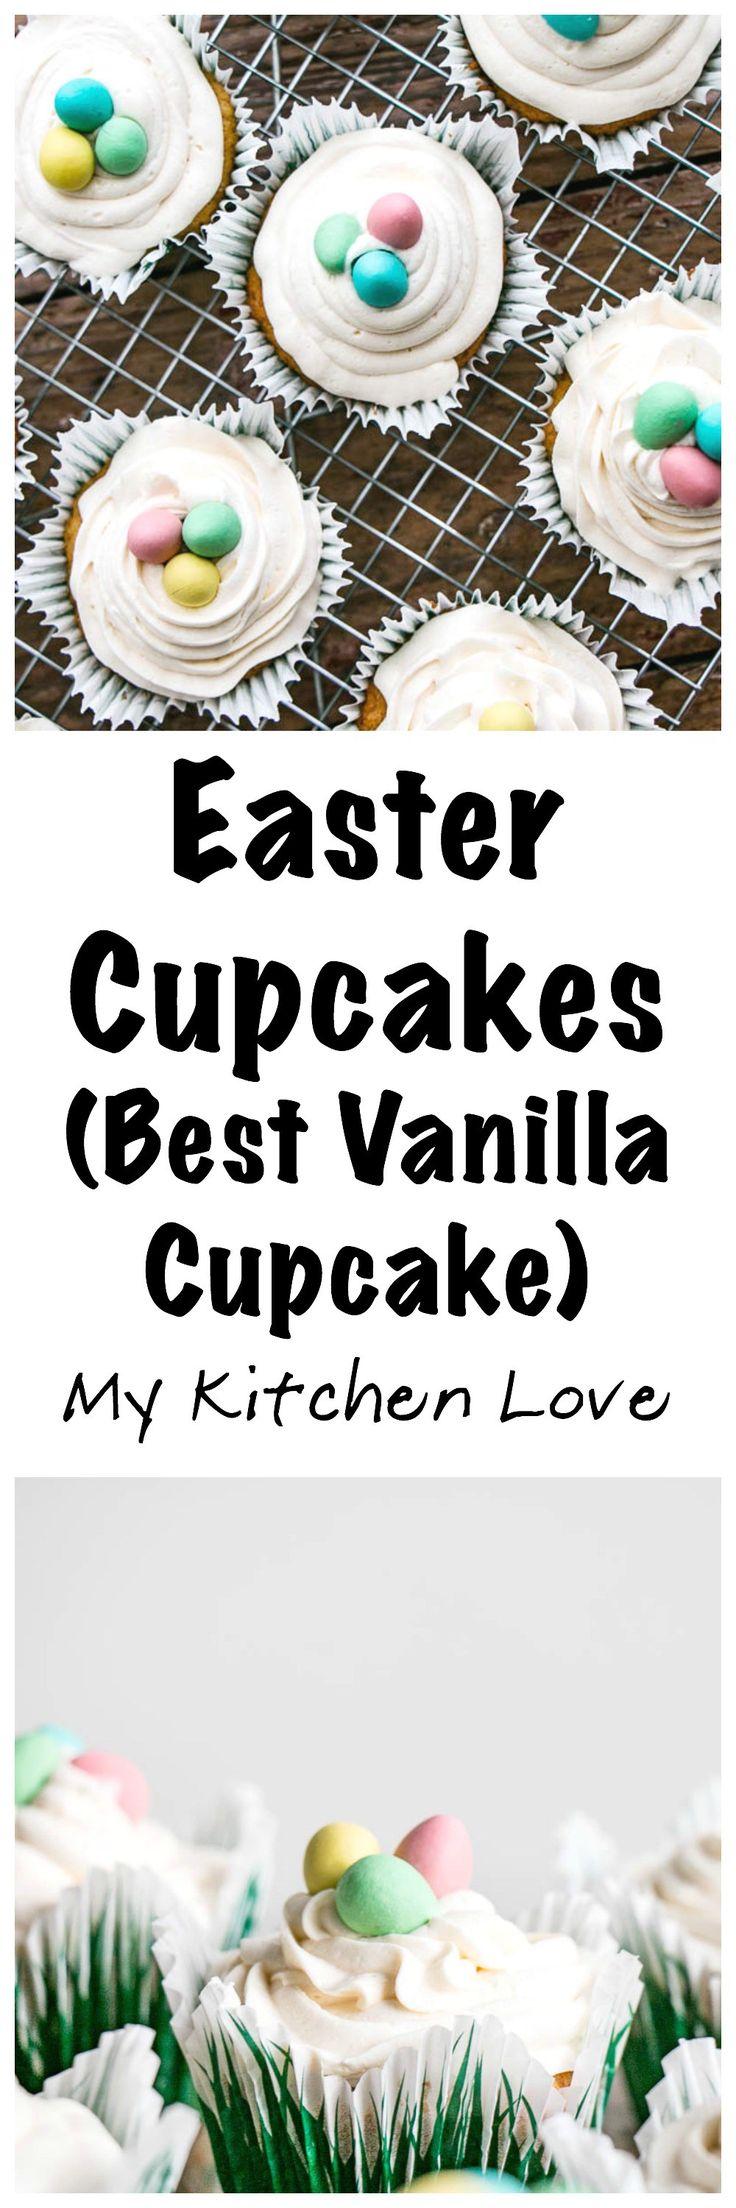 Easter Cupcakes (Best Vanilla Cupcake Recipe) | My Kitchen Love